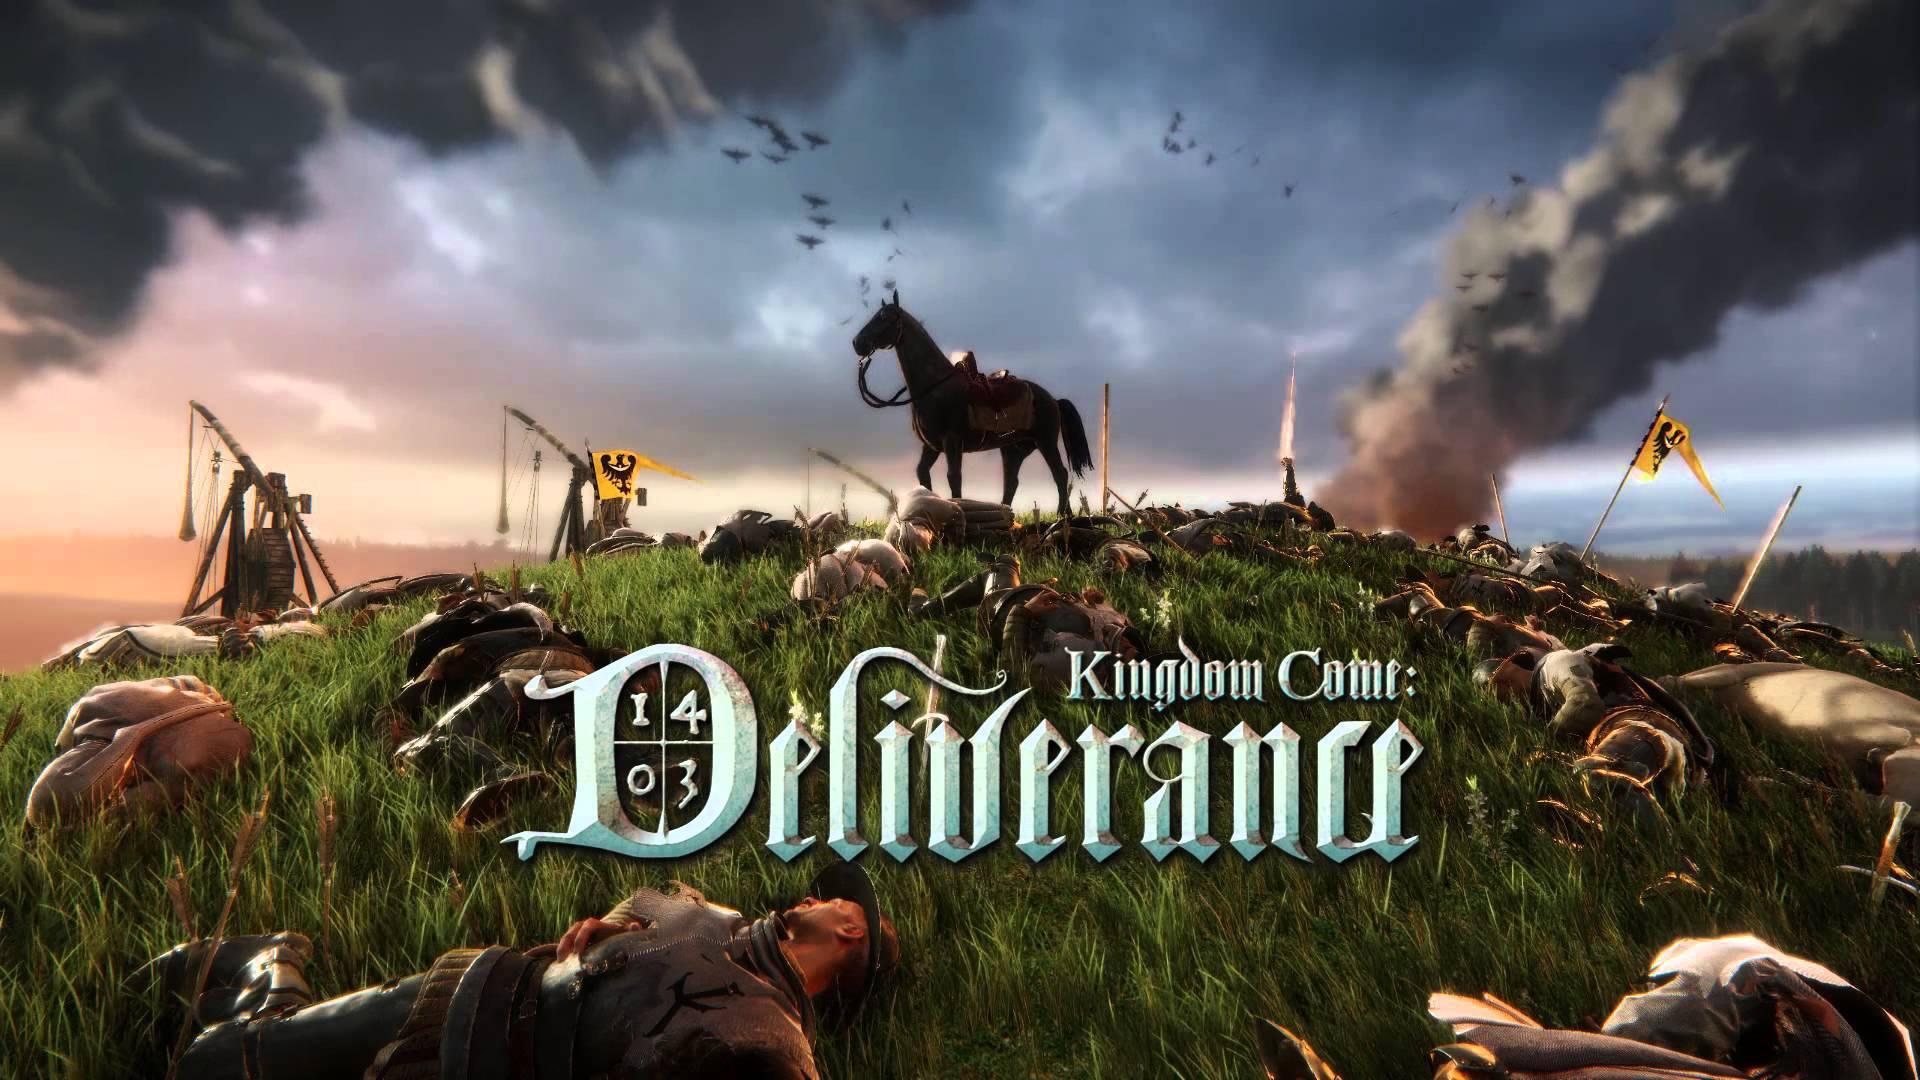 Kingdom Come Deliverance HD Desktop